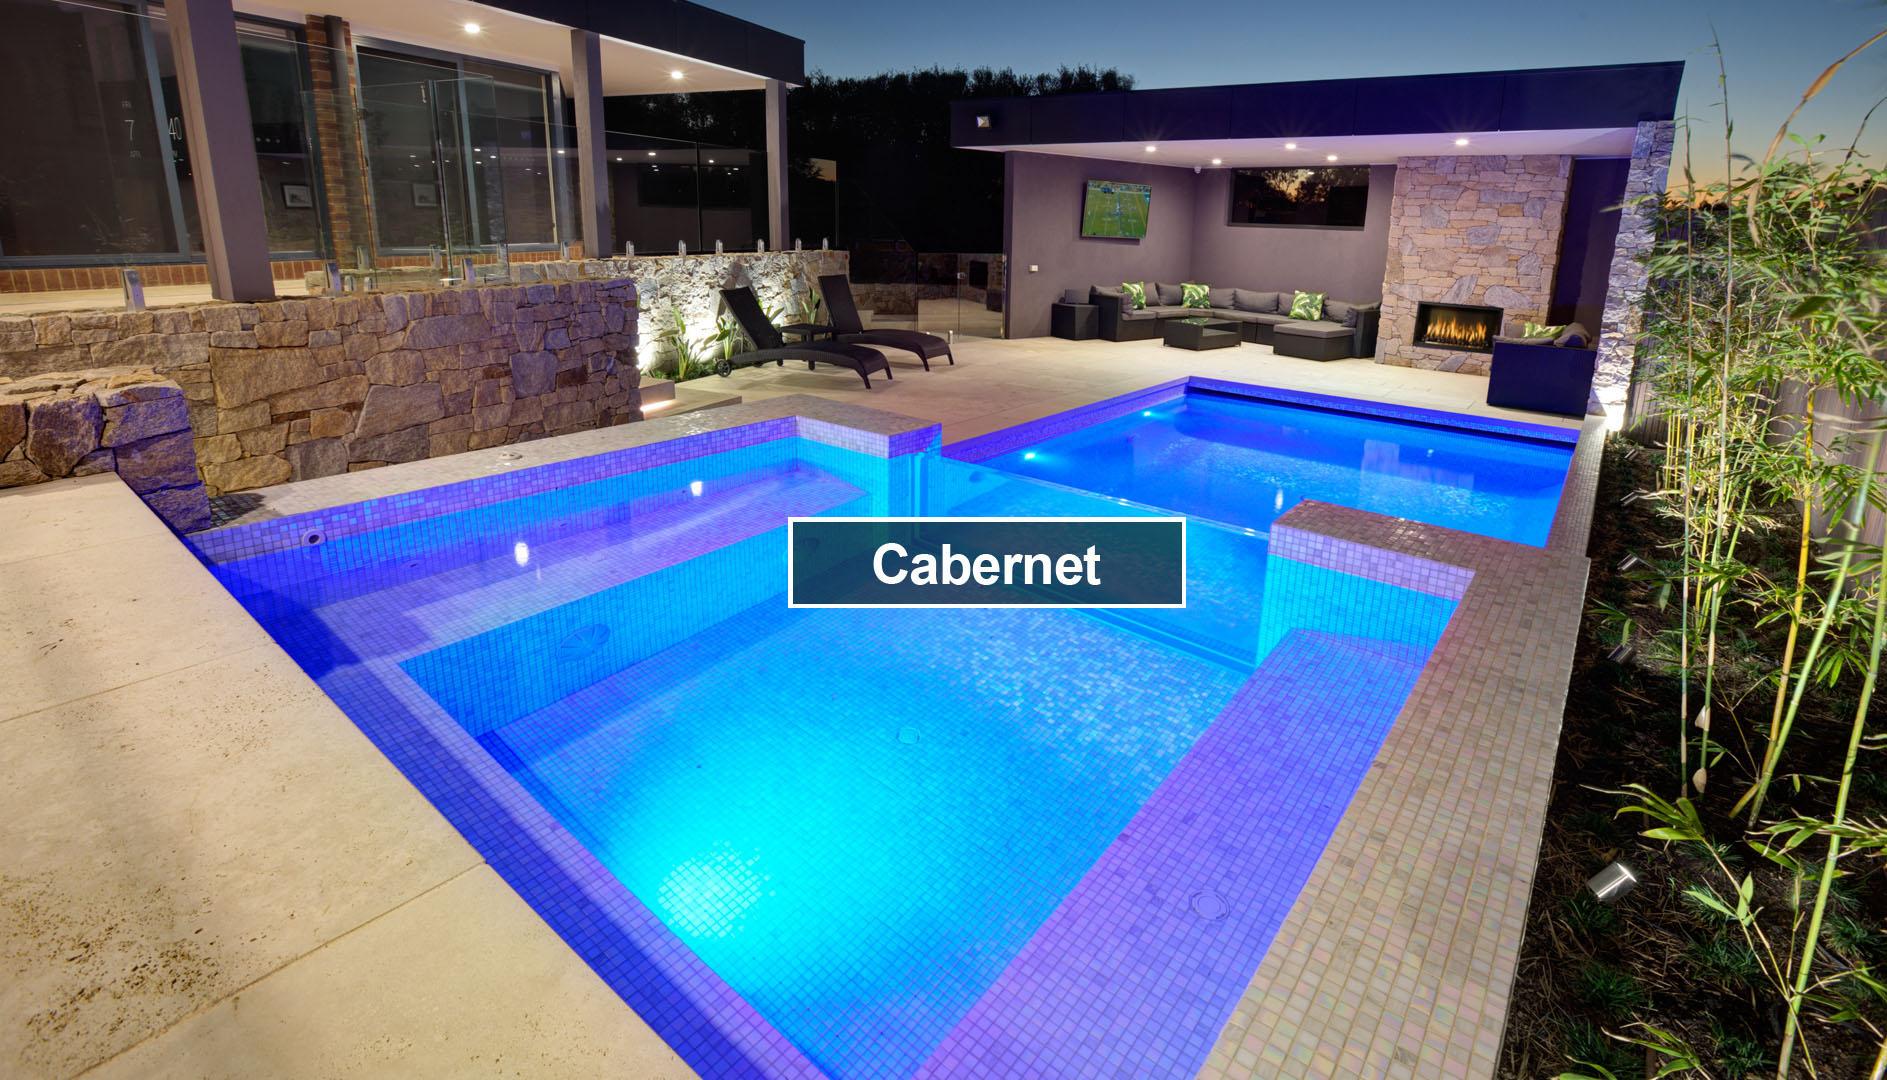 Cabernet - Kiama Pools Swimming Pool Project